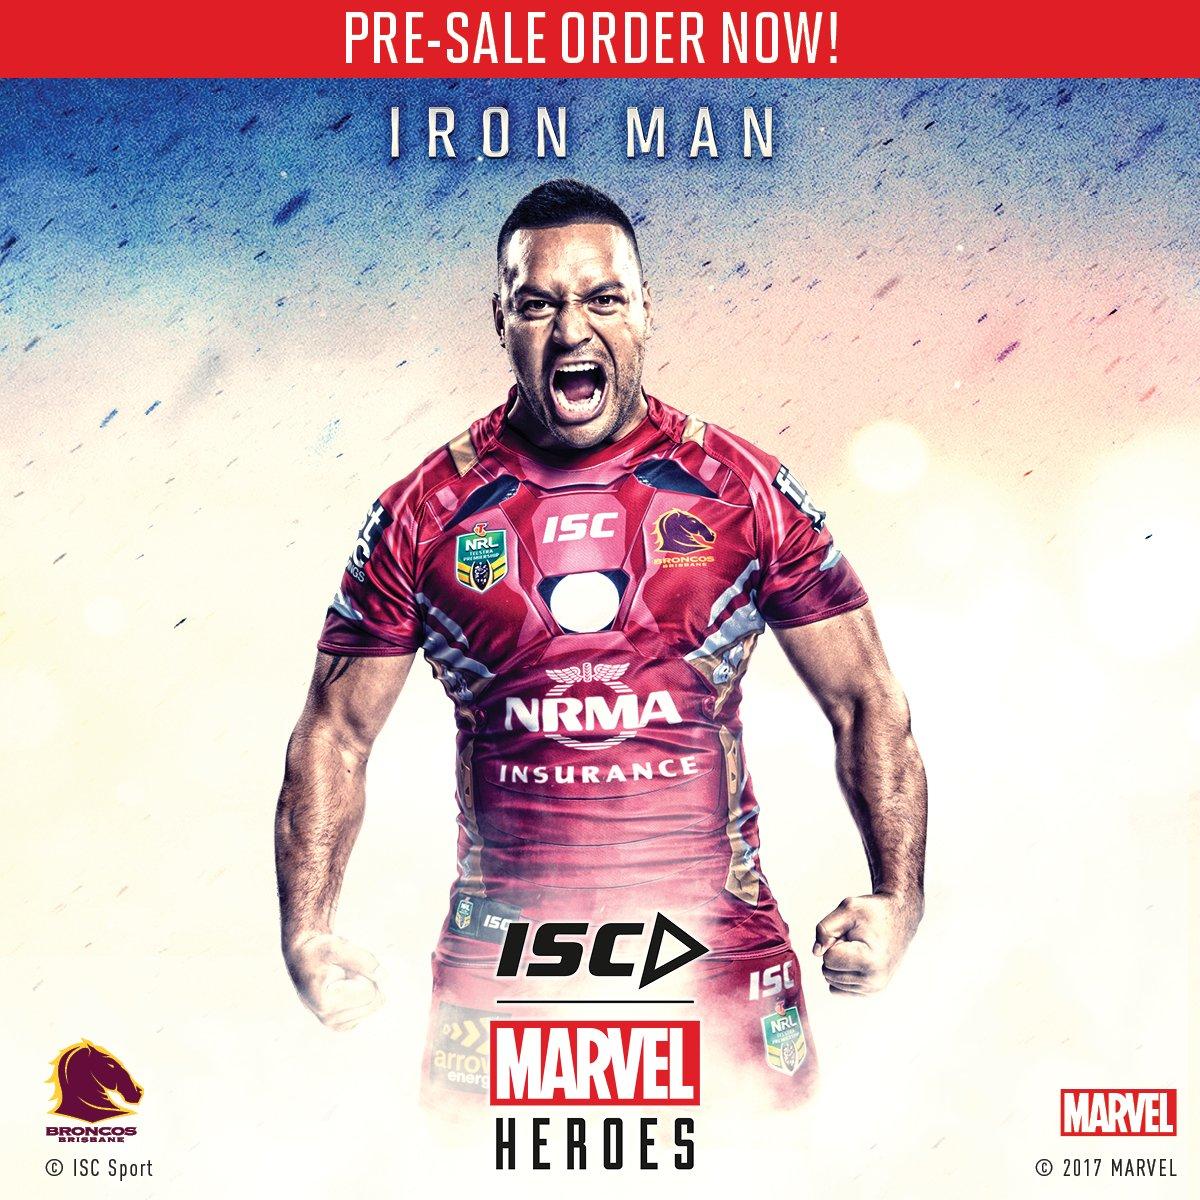 e900bb7c2f7 NEWS: ISC reveals 2017 NRL Marvel Heroes 3 Superhero jerseys – Rugby ...